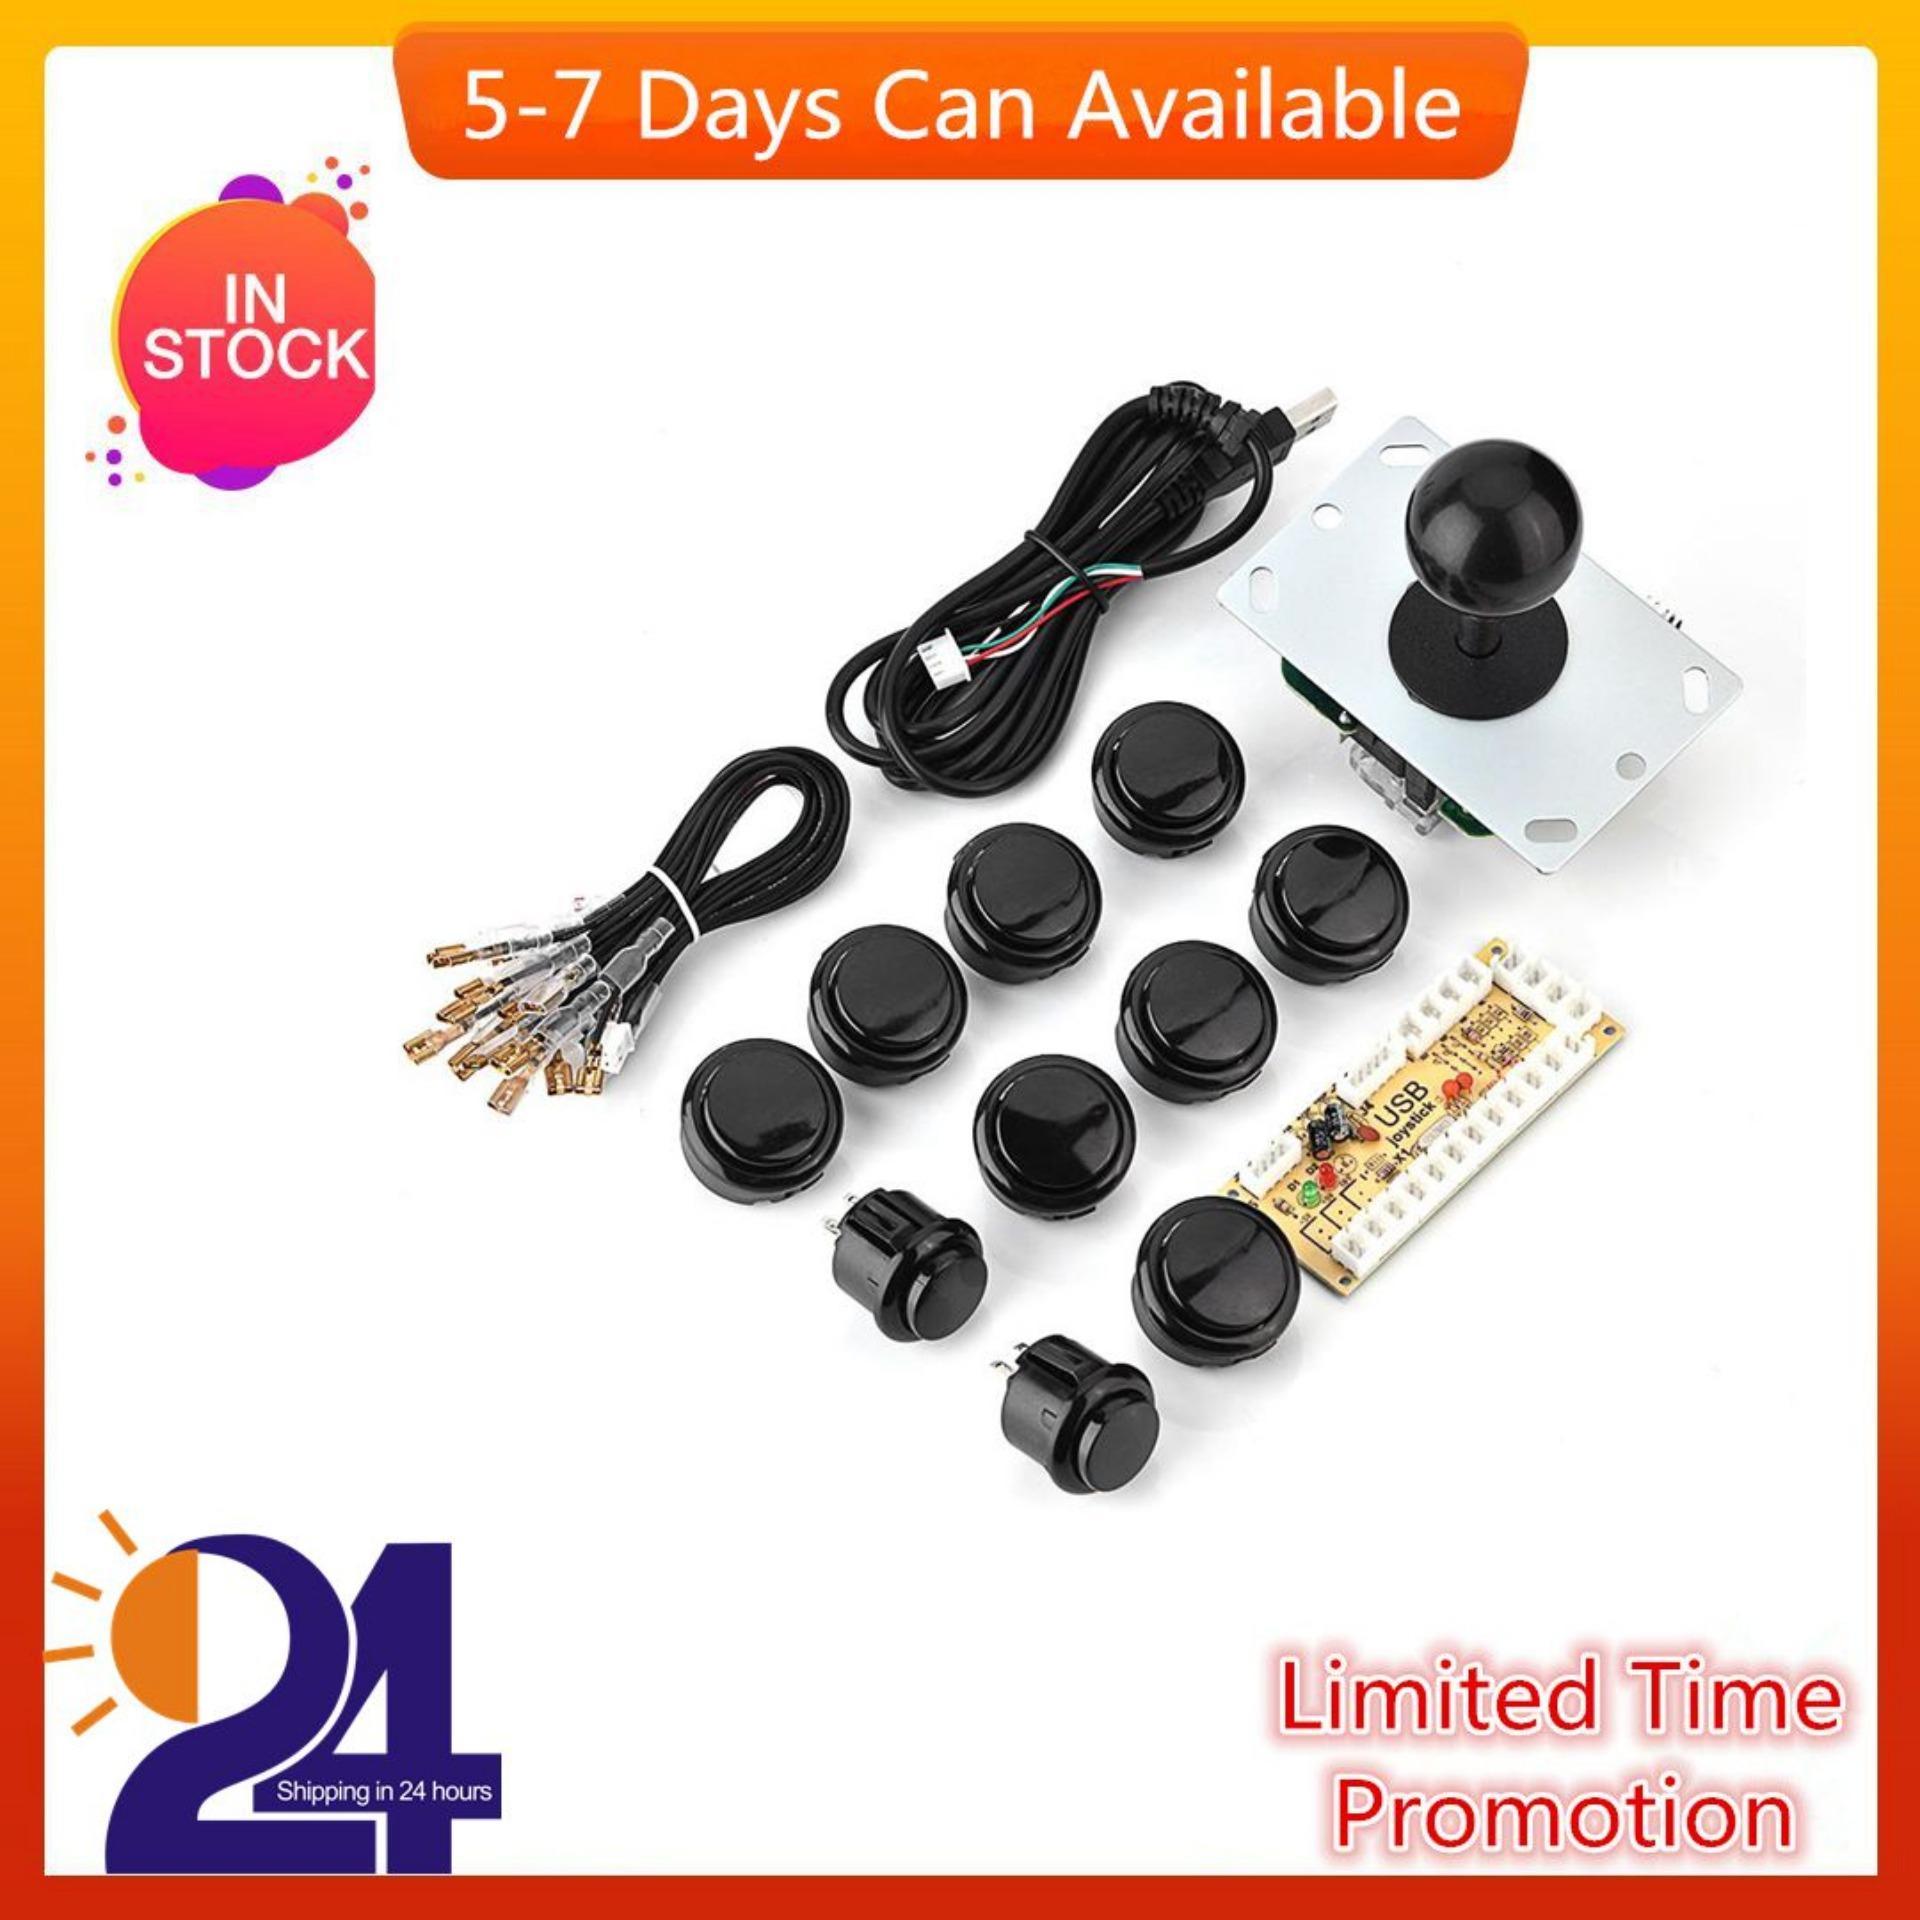 Arcade Game DIY Parts Kit Zero Delay USB Encoder + Joystick + Button for  Mame Game (Black) - intl